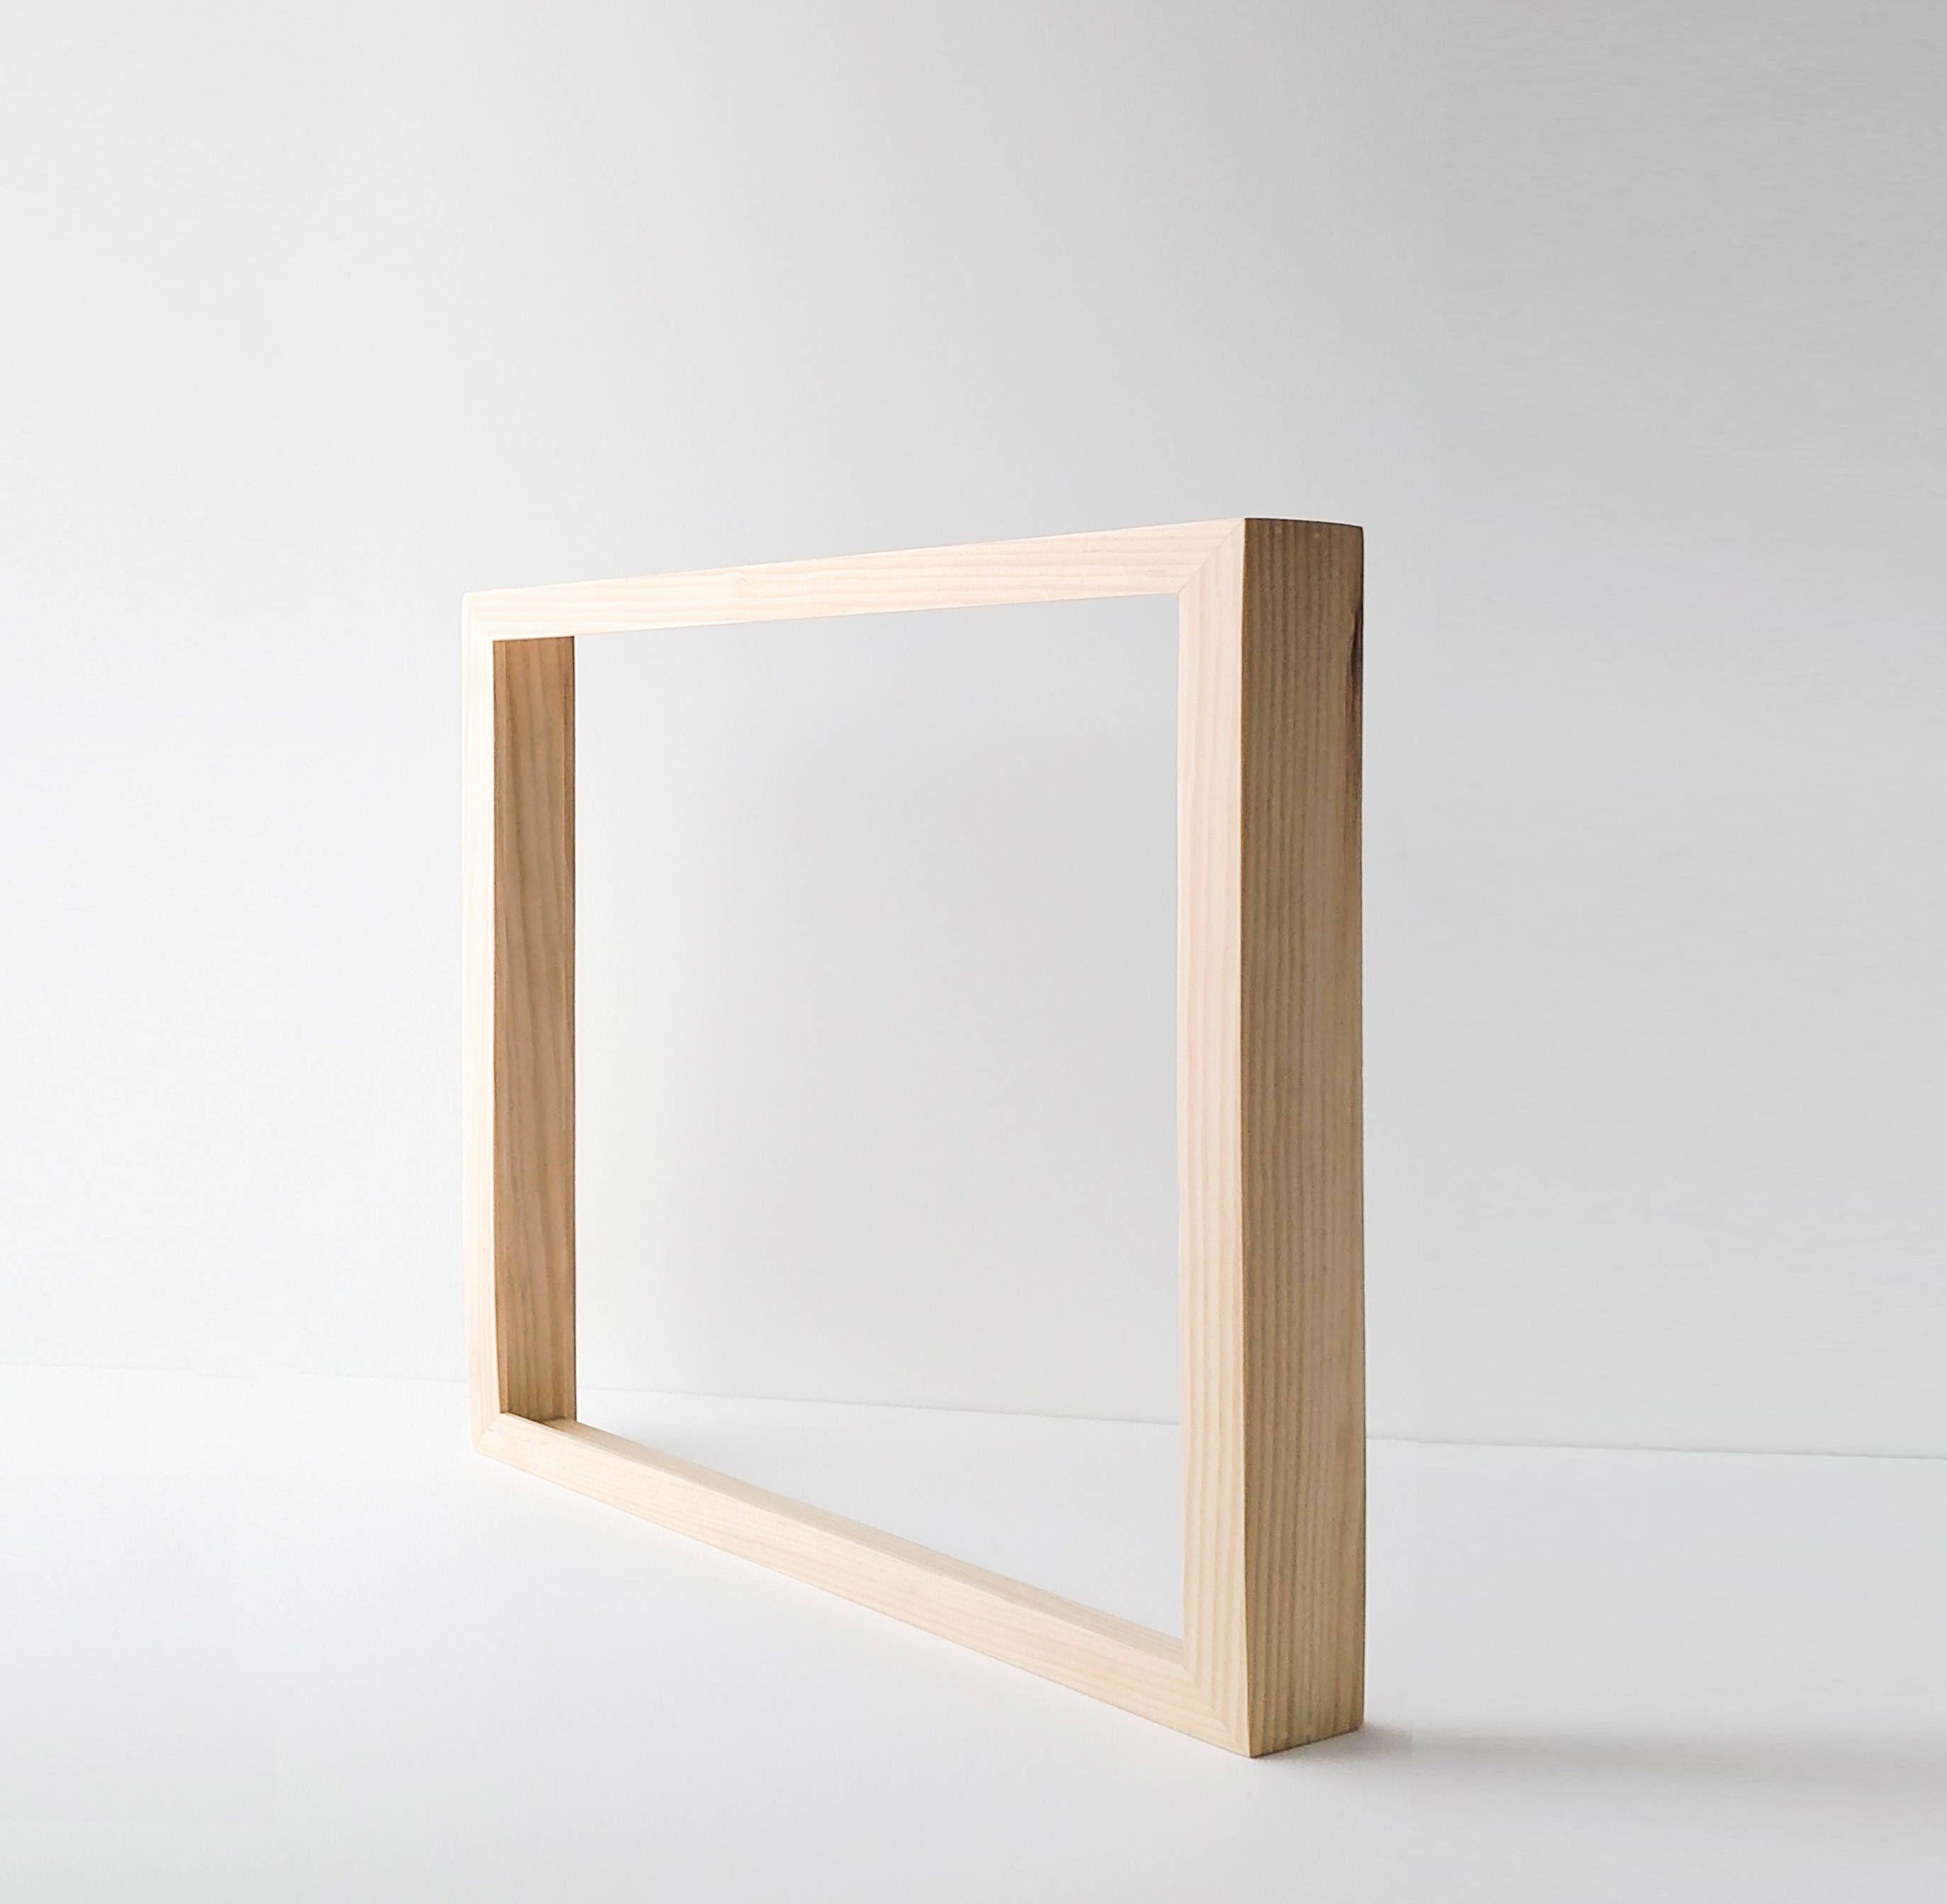 Custom Canvas Frame - Wood Frame for Canvas Painting or Canvas Print ...